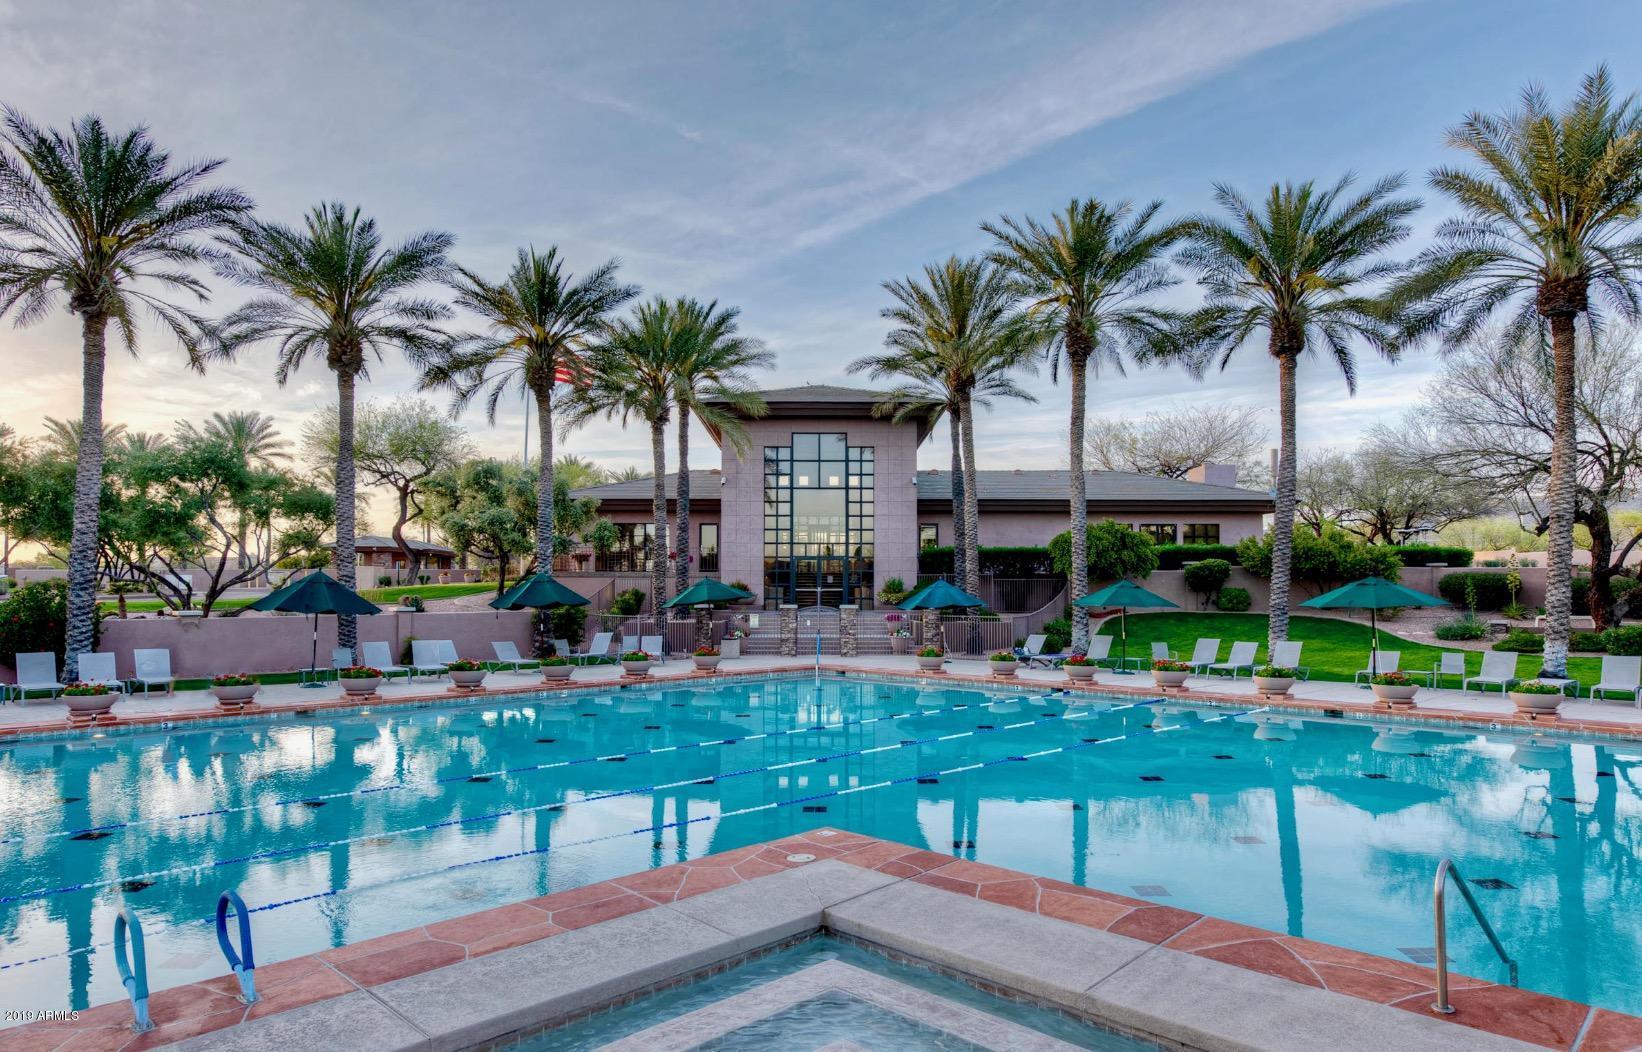 MLS 5966980 12068 E BELLA VISTA Circle, Scottsdale, AZ 85259 Scottsdale AZ Stonegate